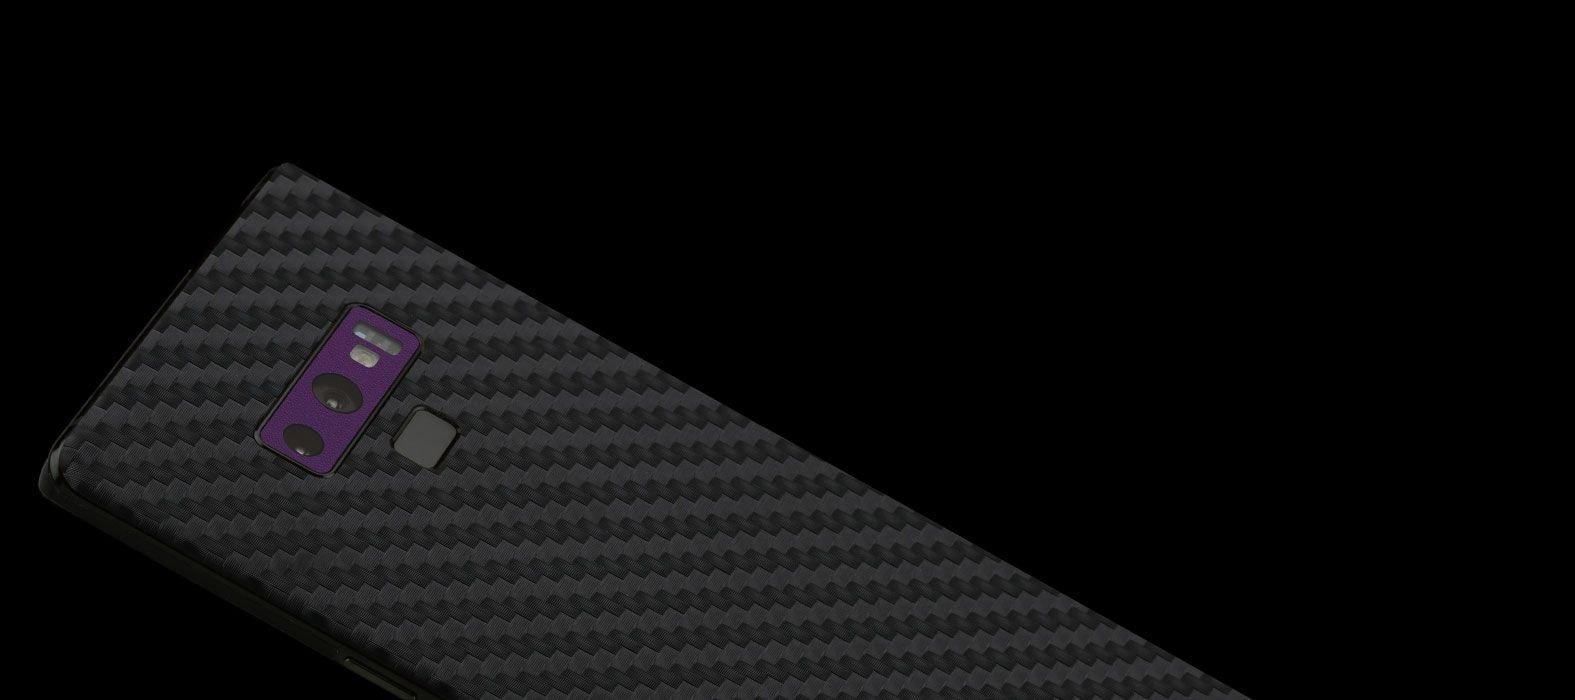 Galaxy Note 9 Black Carbon Fiber Skins